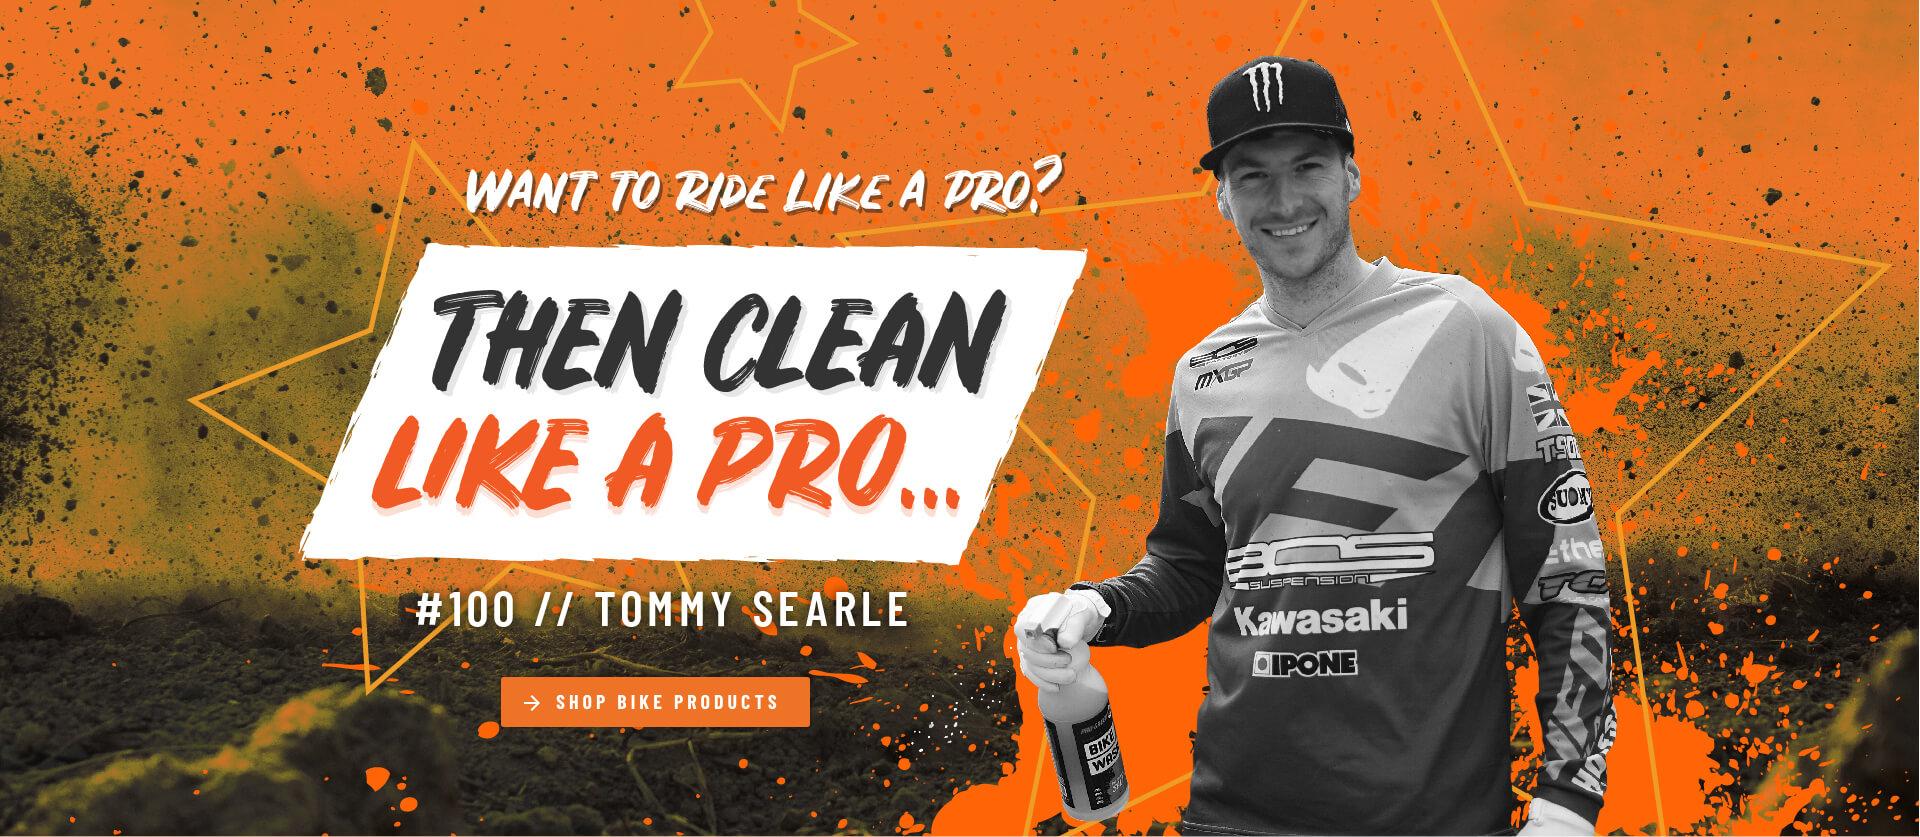 Tommy Searle